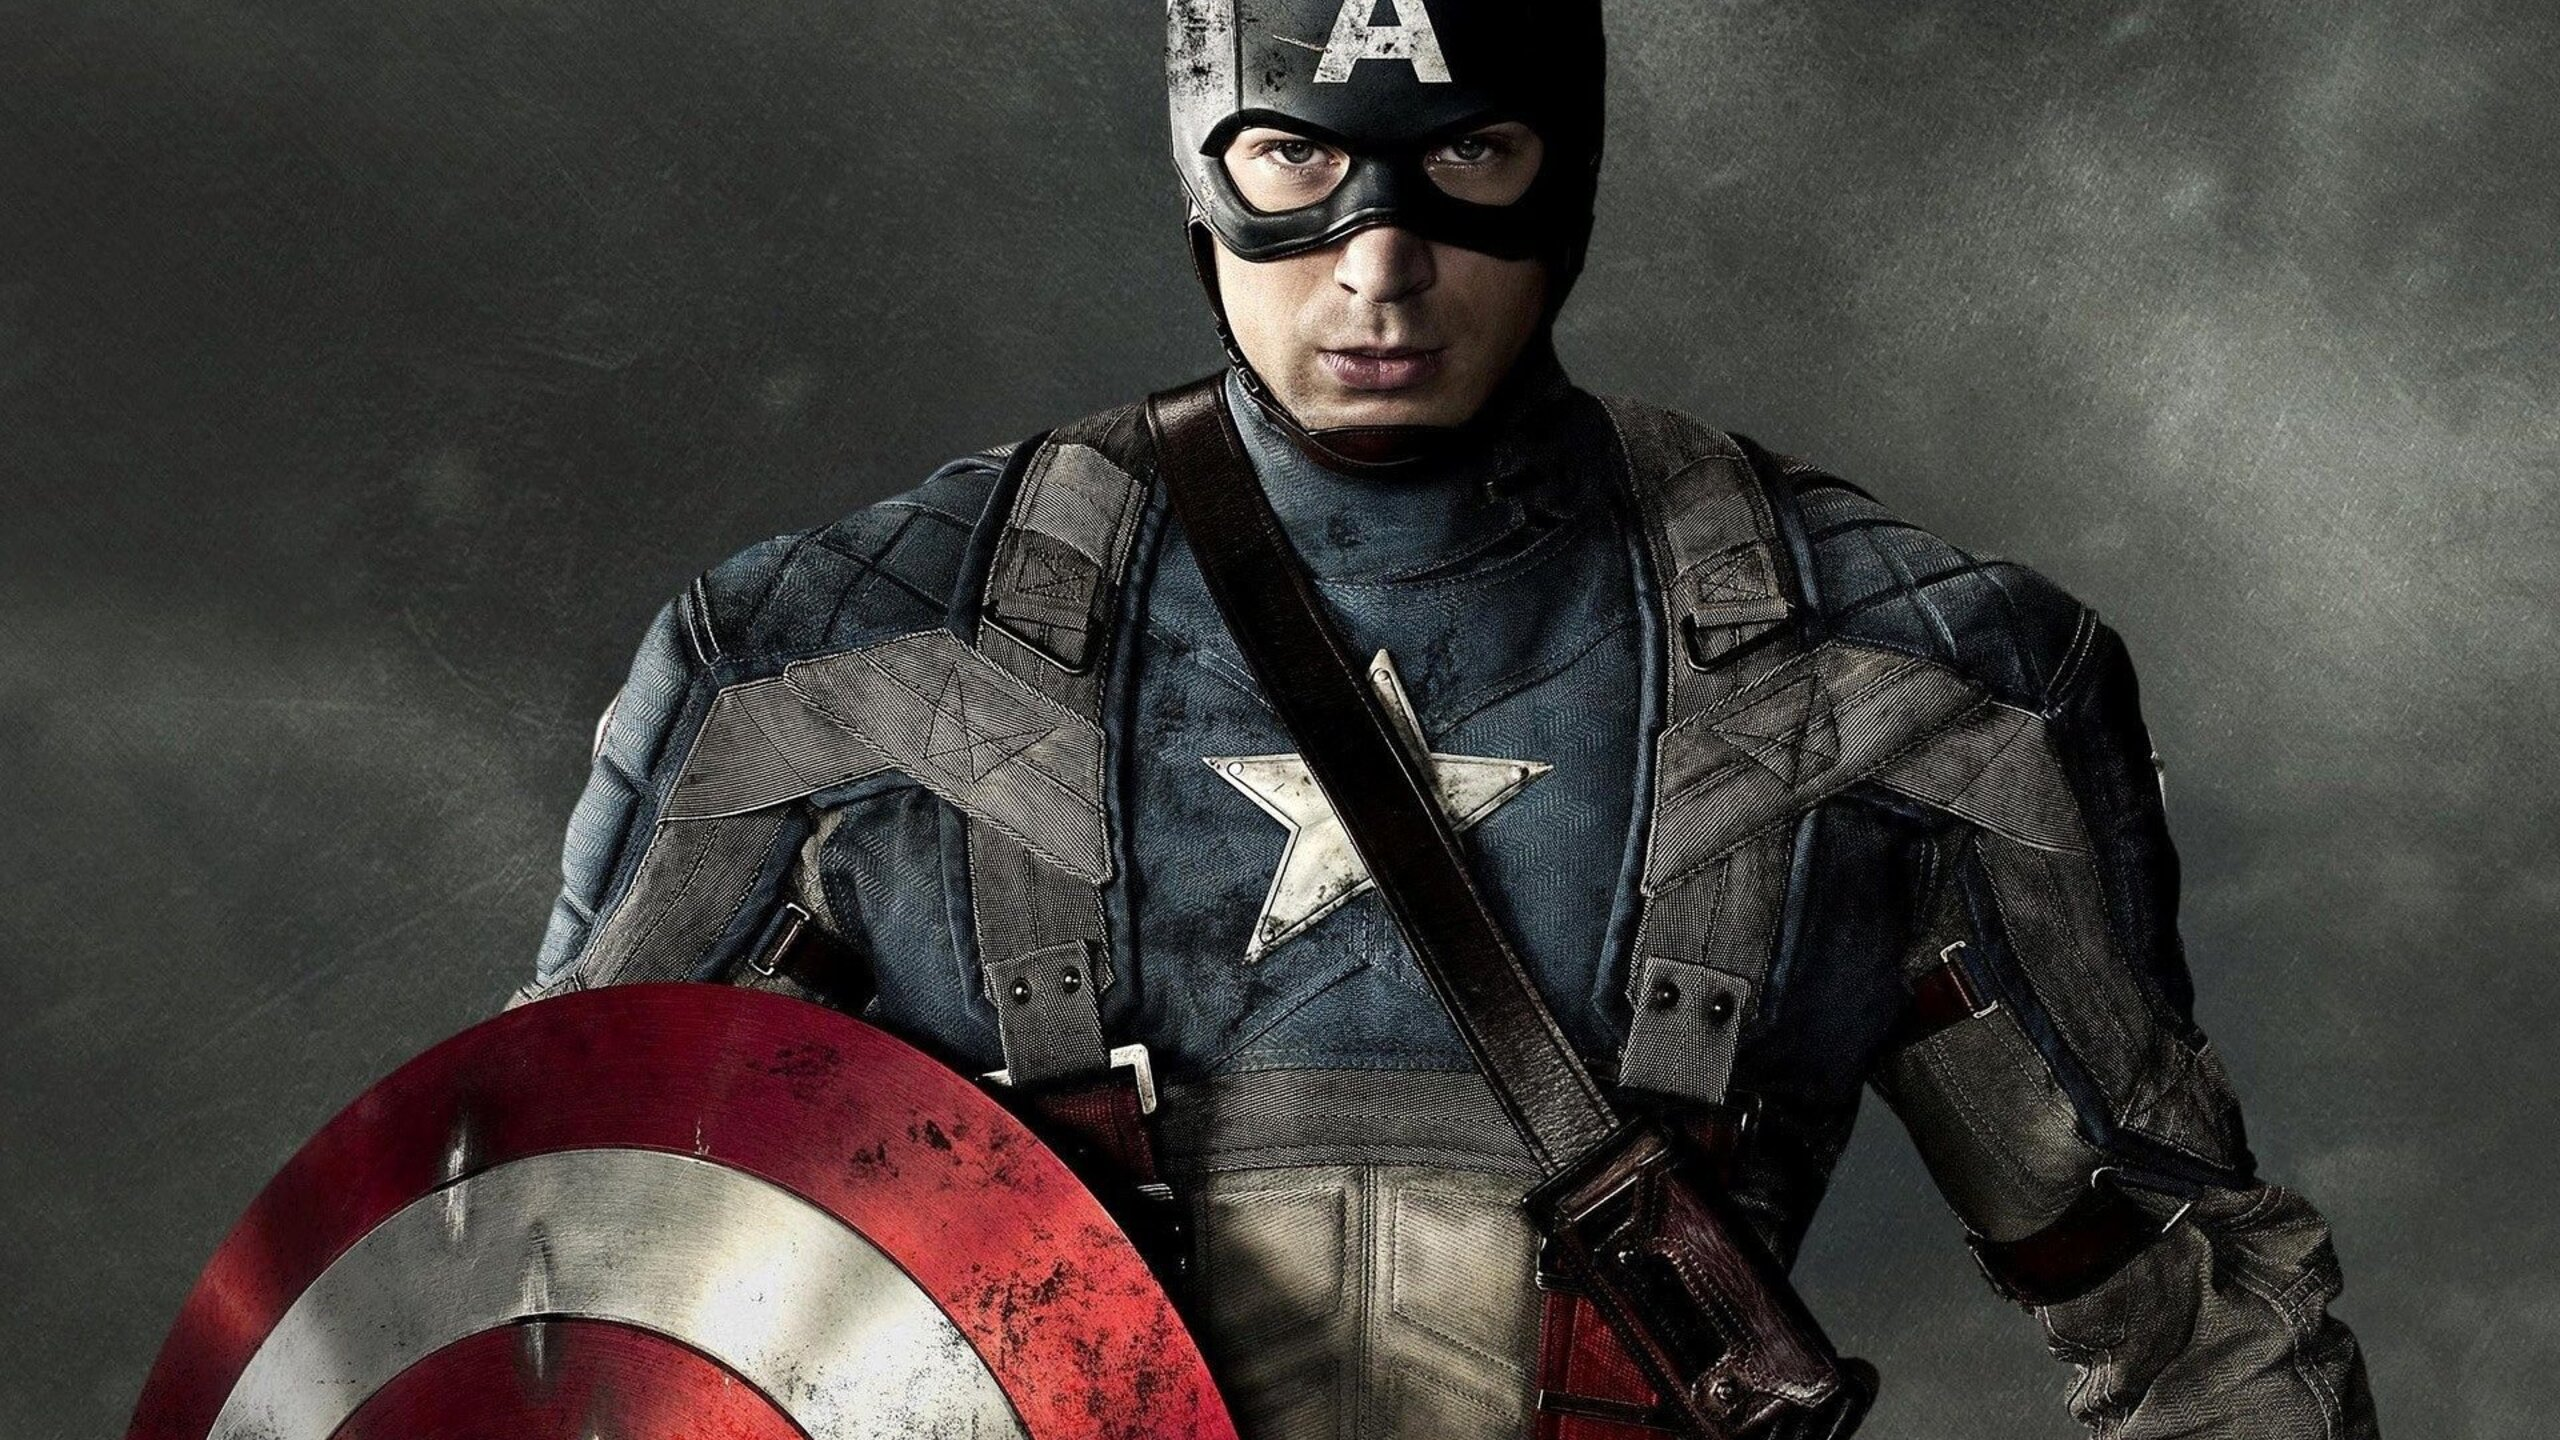 2560x1440 Captain America Civil War 2 1440p Resolution Hd 4k